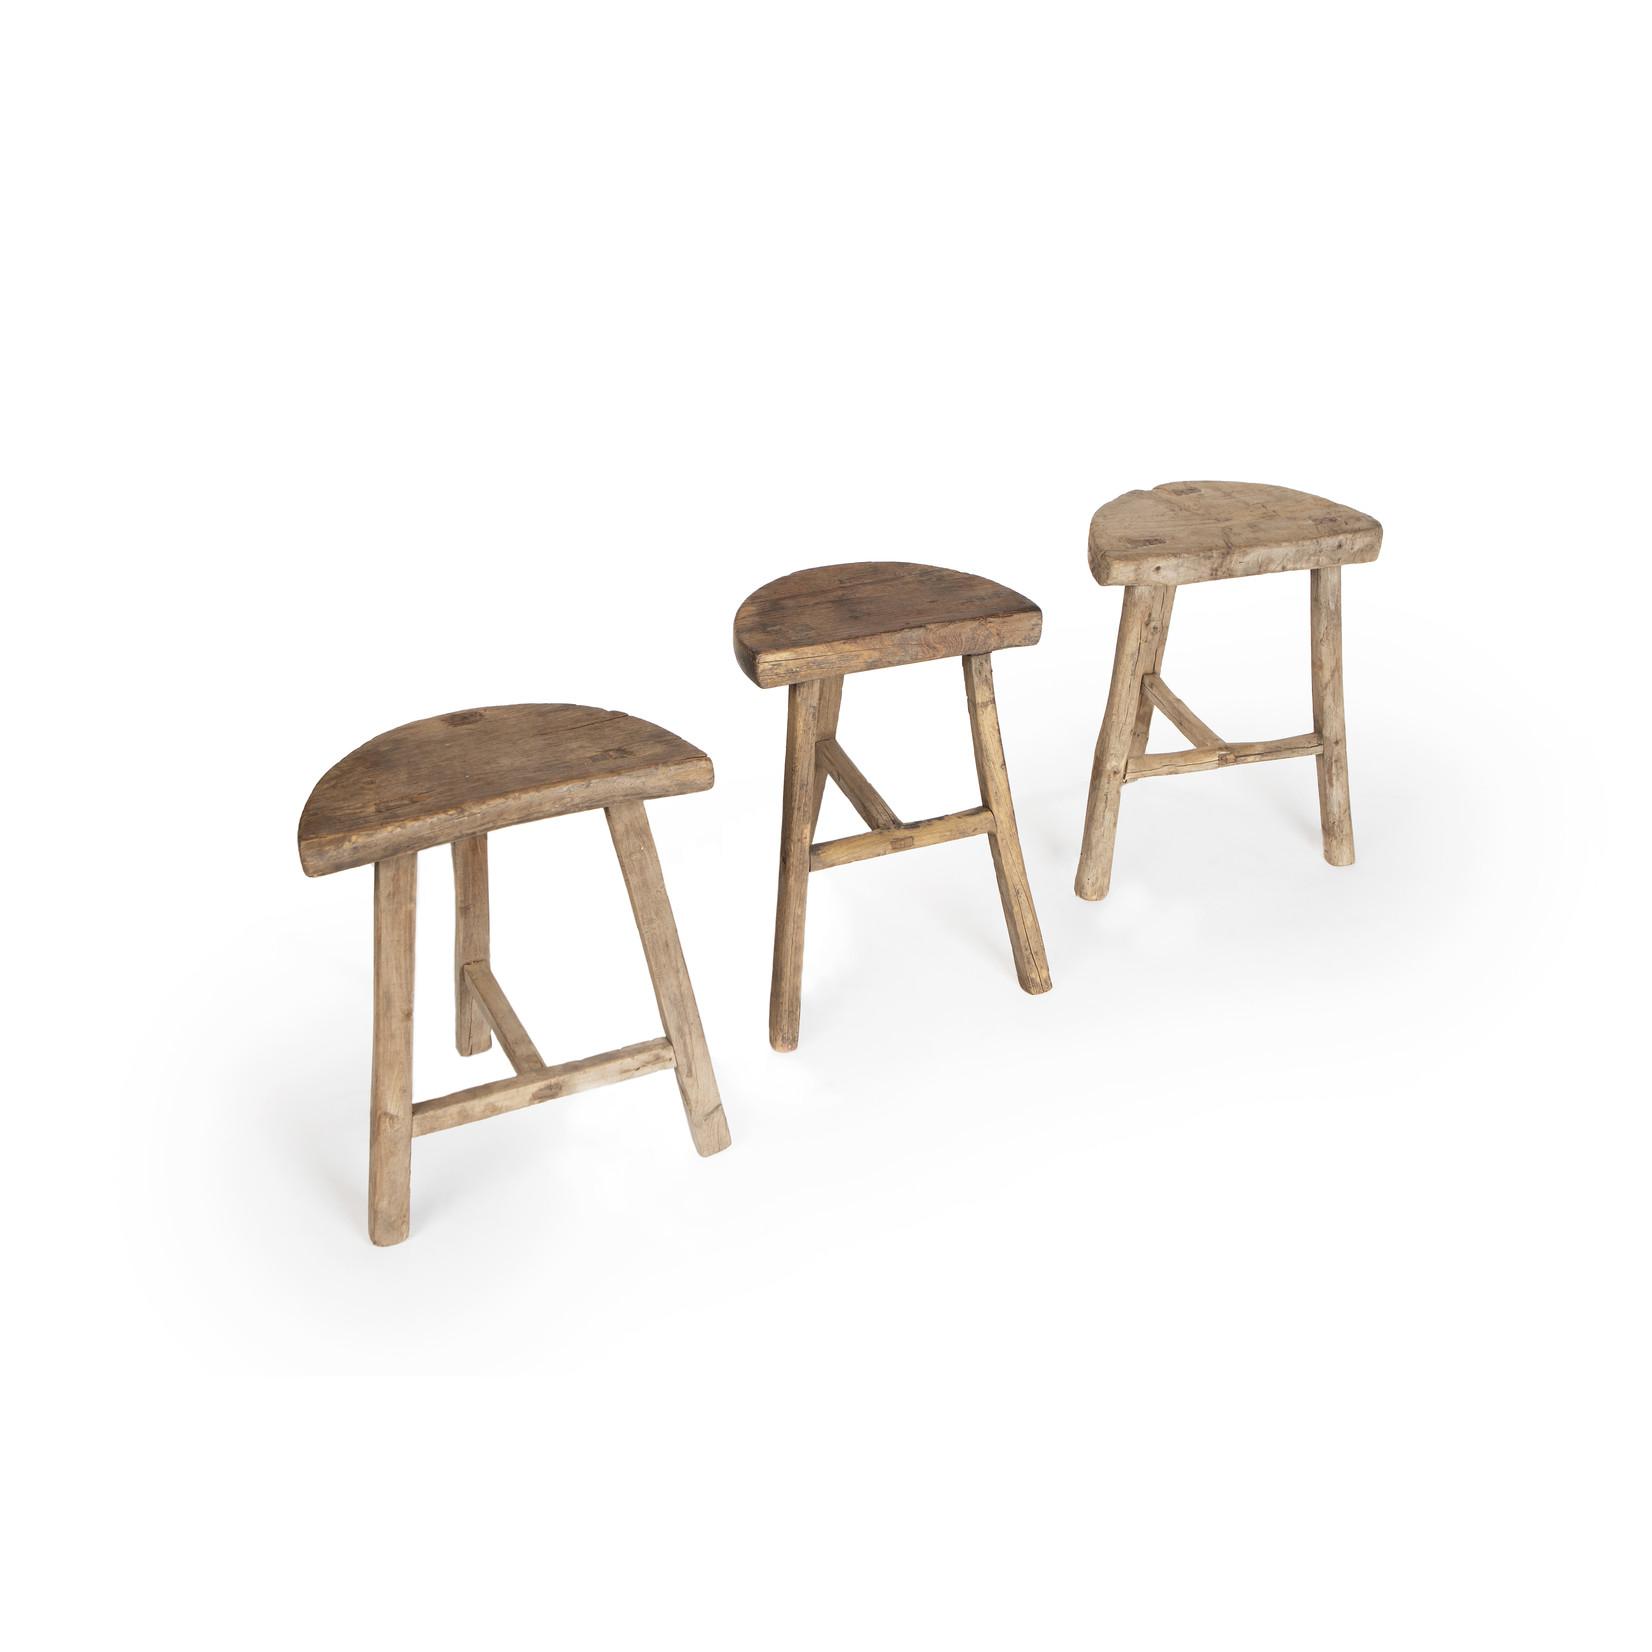 Old Chinese round stool  - half round ''moon stool''